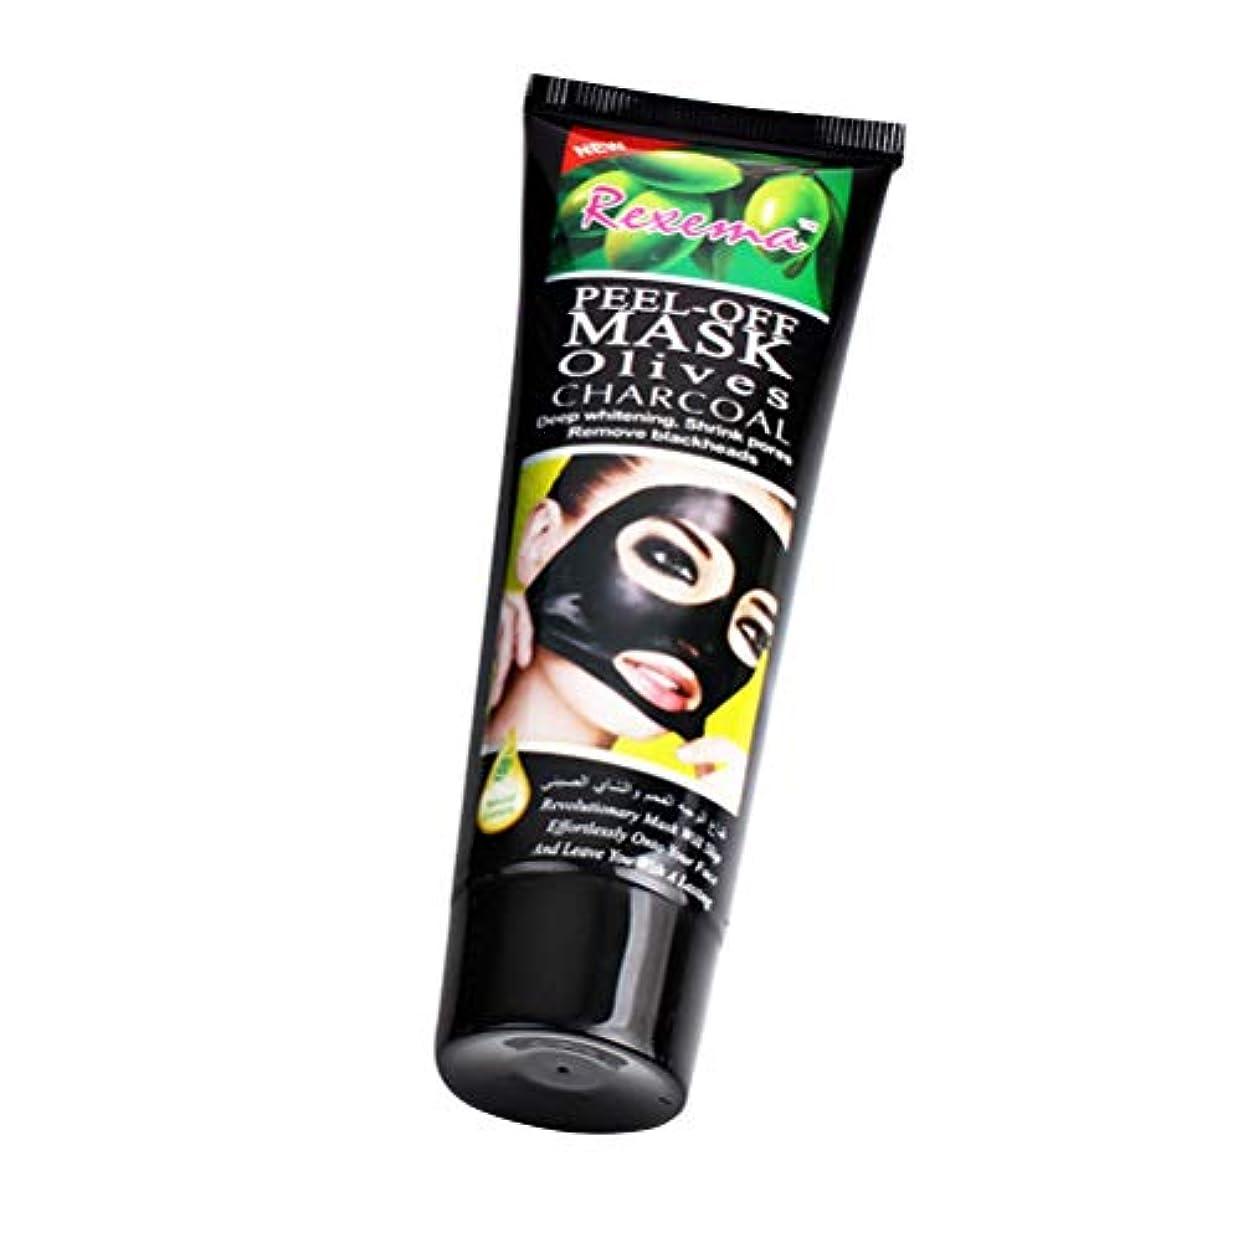 Healifty スキンケア保湿ディープポアクレンジングフェイスマスクを引き締めるオリーブ栄養フェイシャルマスク